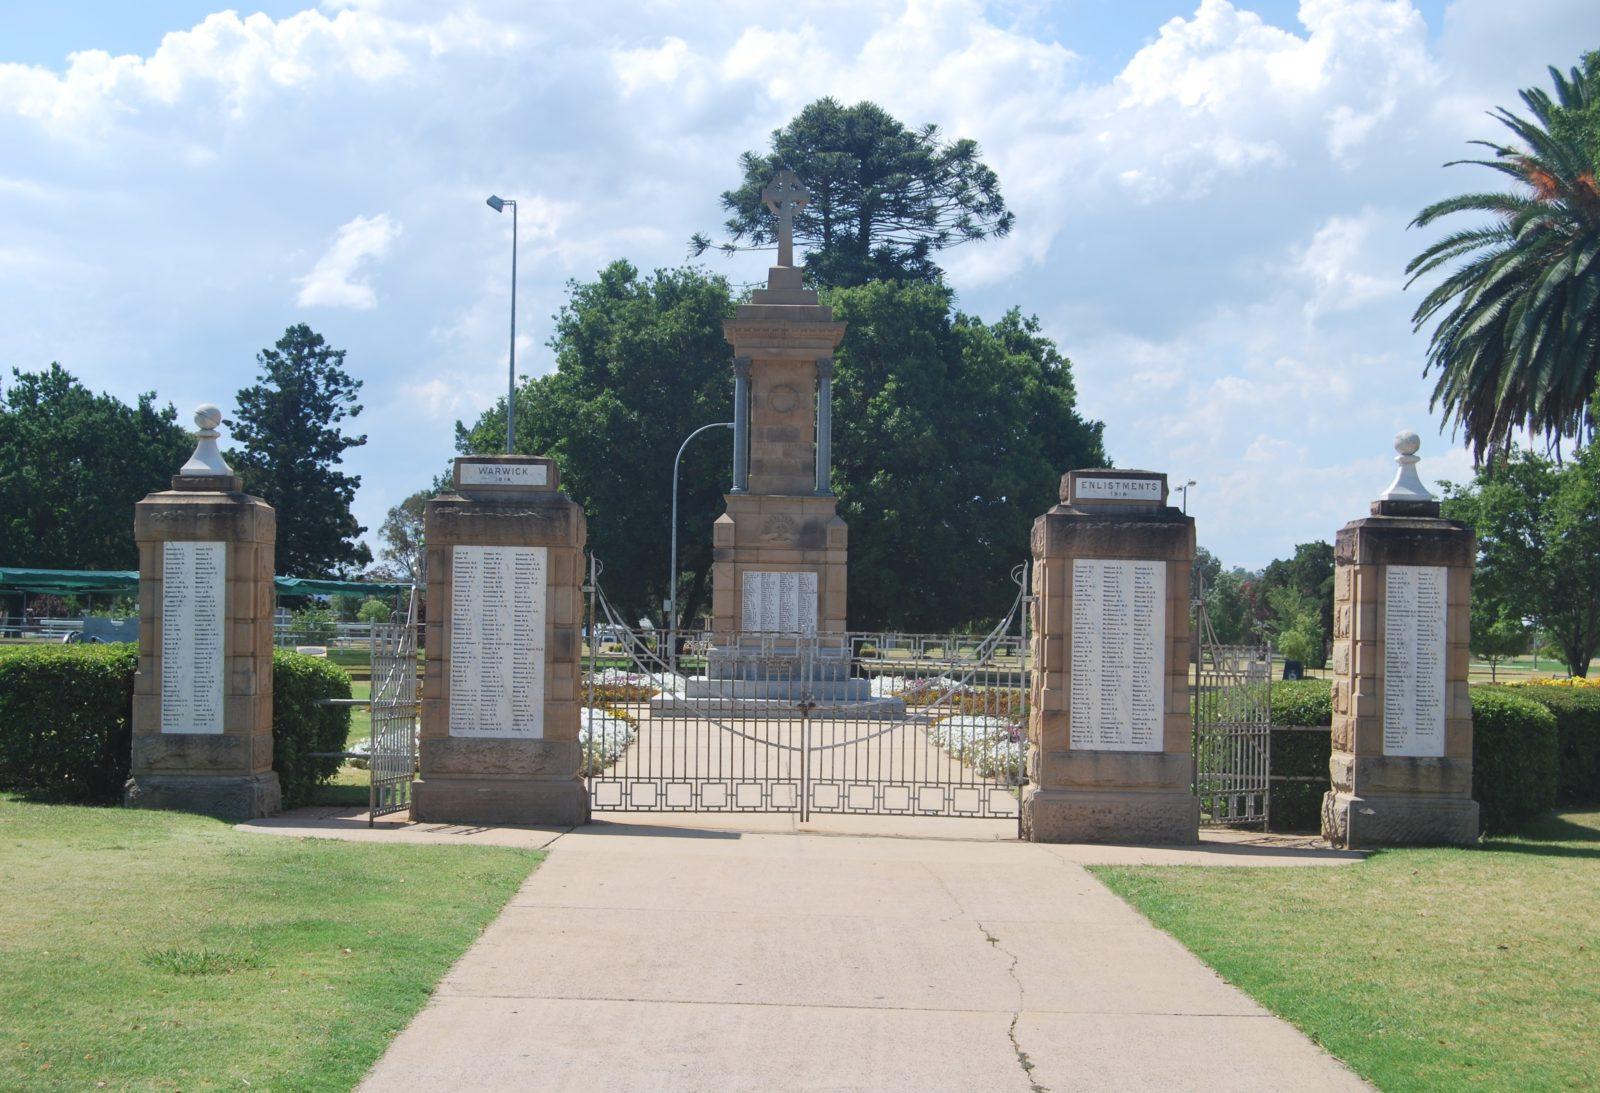 Warwick War Memorial and Gates